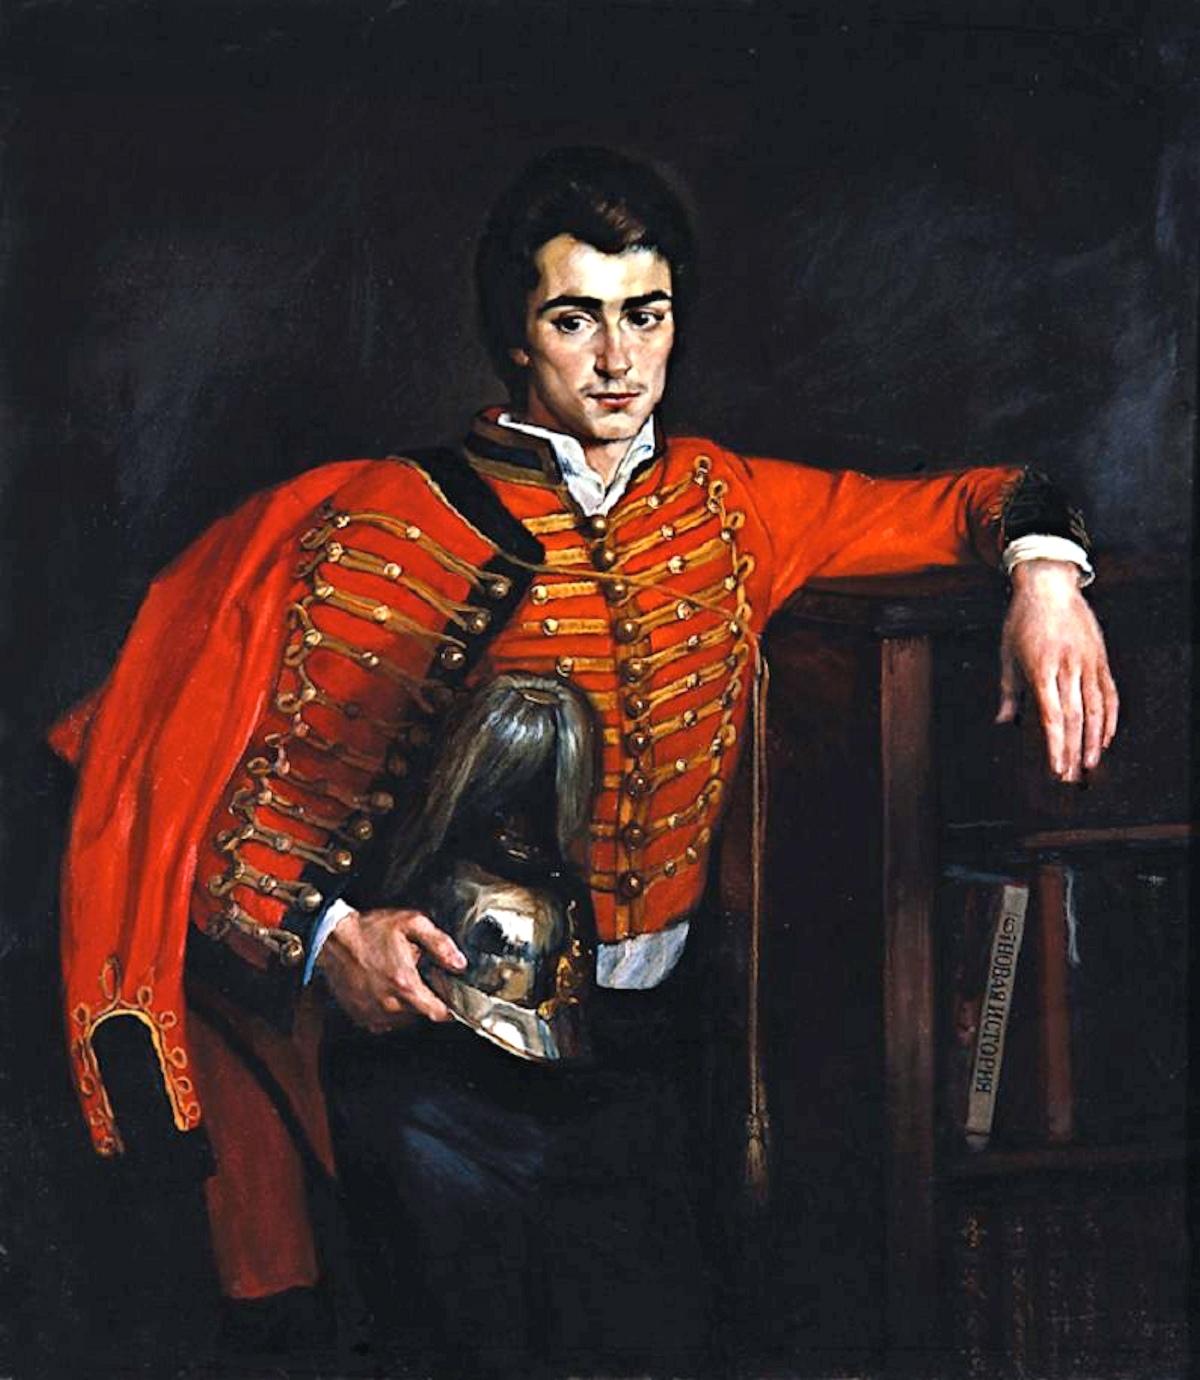 00 Mikhail Shankov. A Portrait of a Man in a Hussar's Uniform. 1983